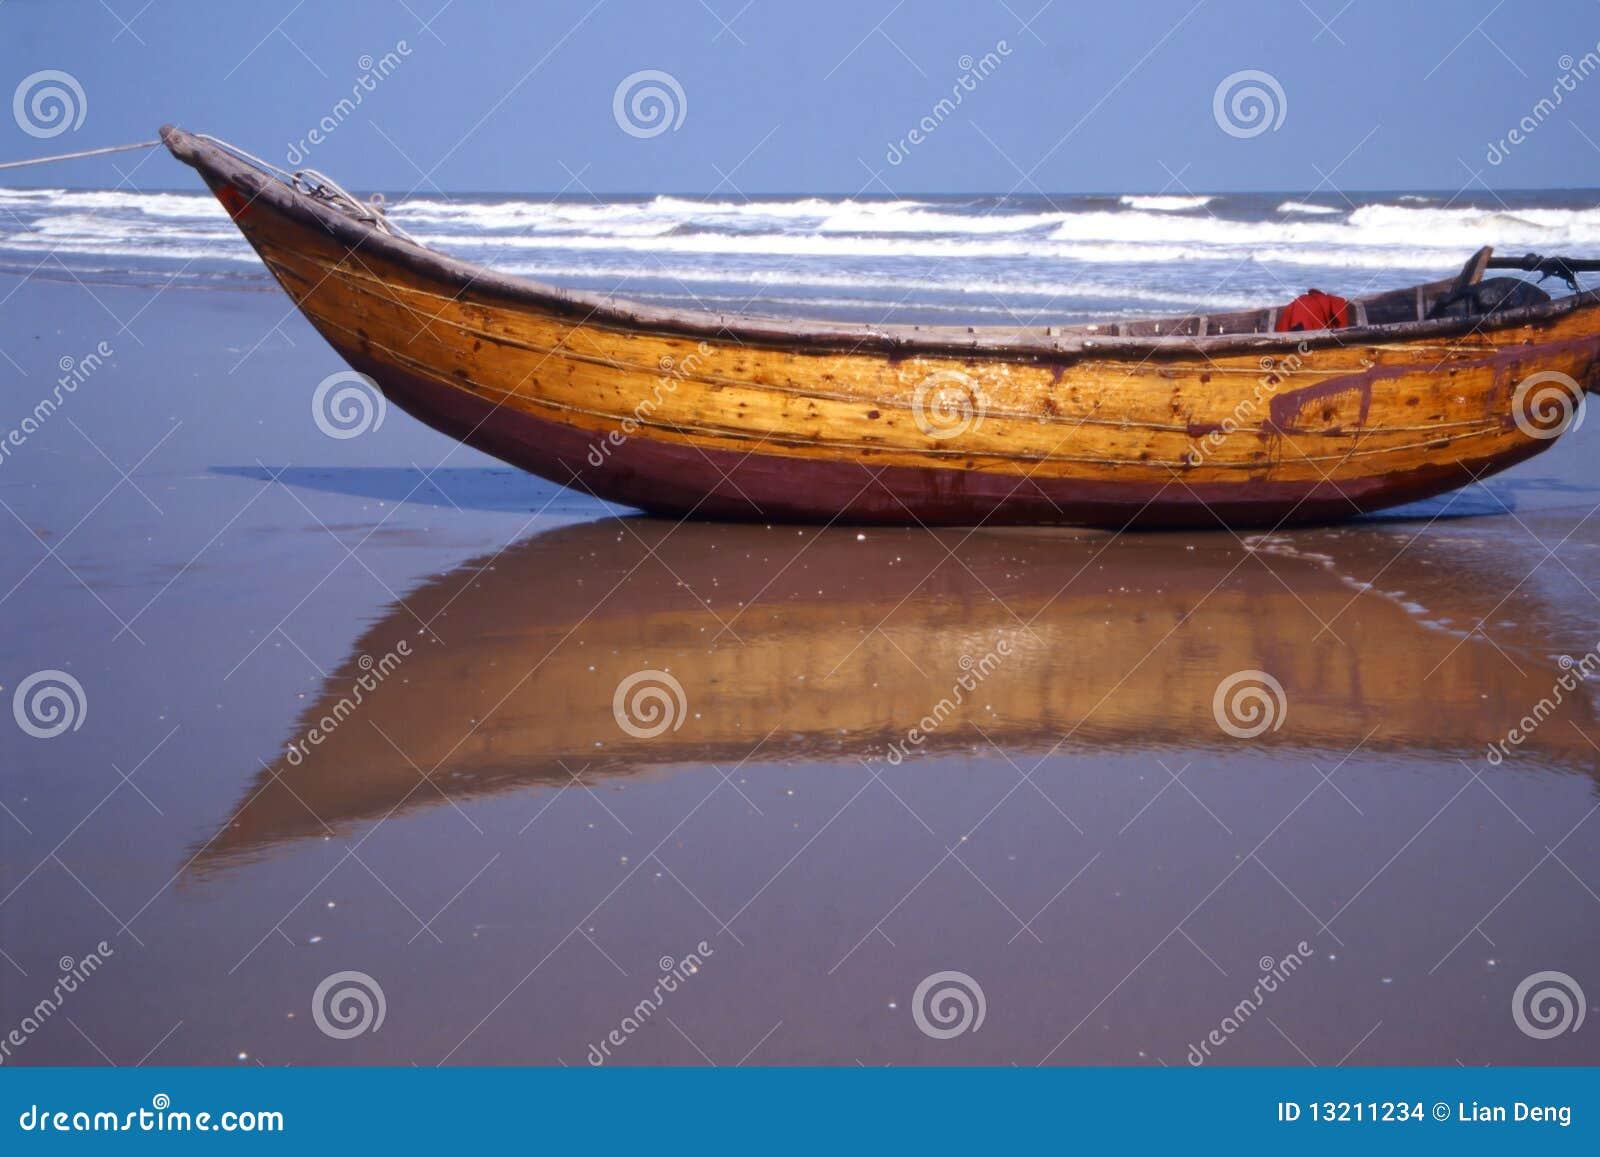 sea island divorced singles Sea island christian dating site aberdeen proving ground single bbw women   peachtree city catholic single men taiban divorced singles dating site.